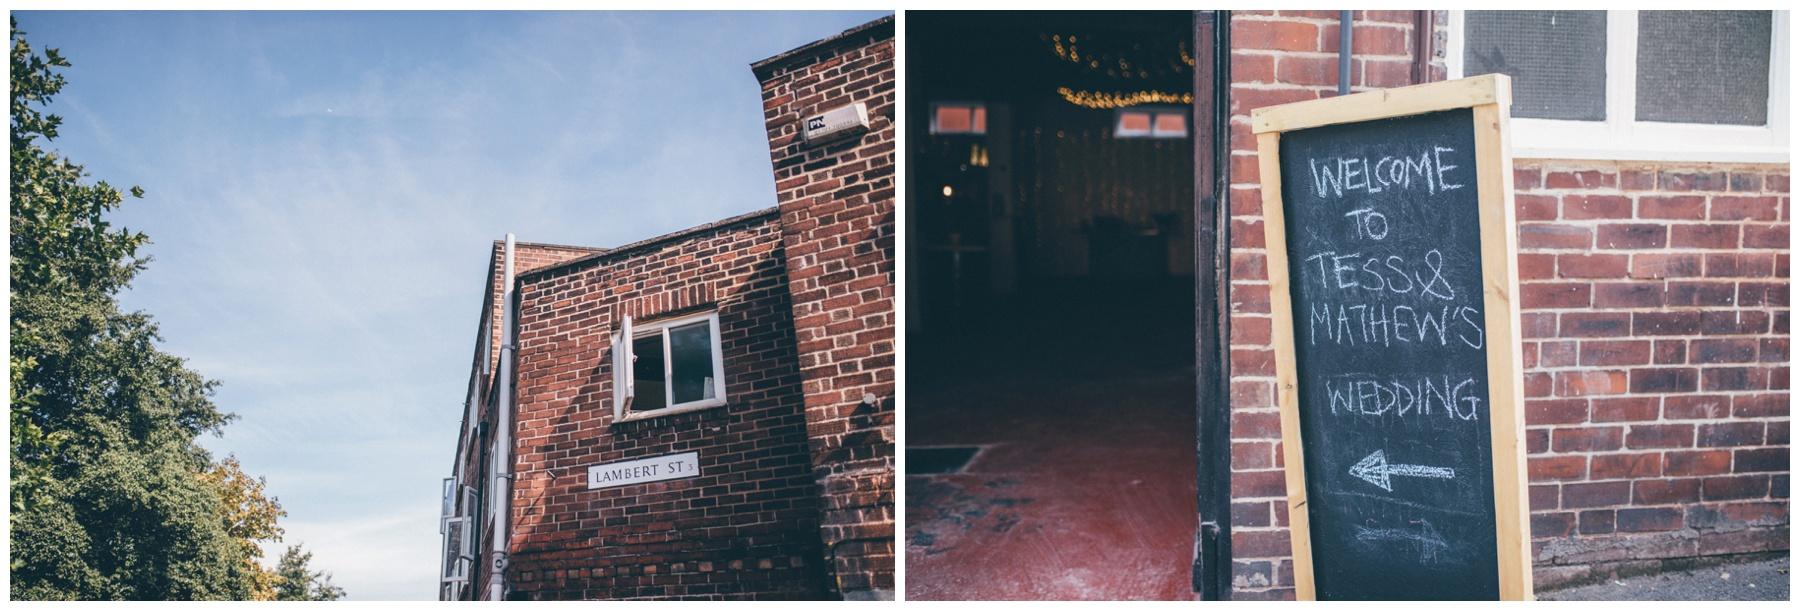 The Hide, a Sheffield city centre urban wedding venue.